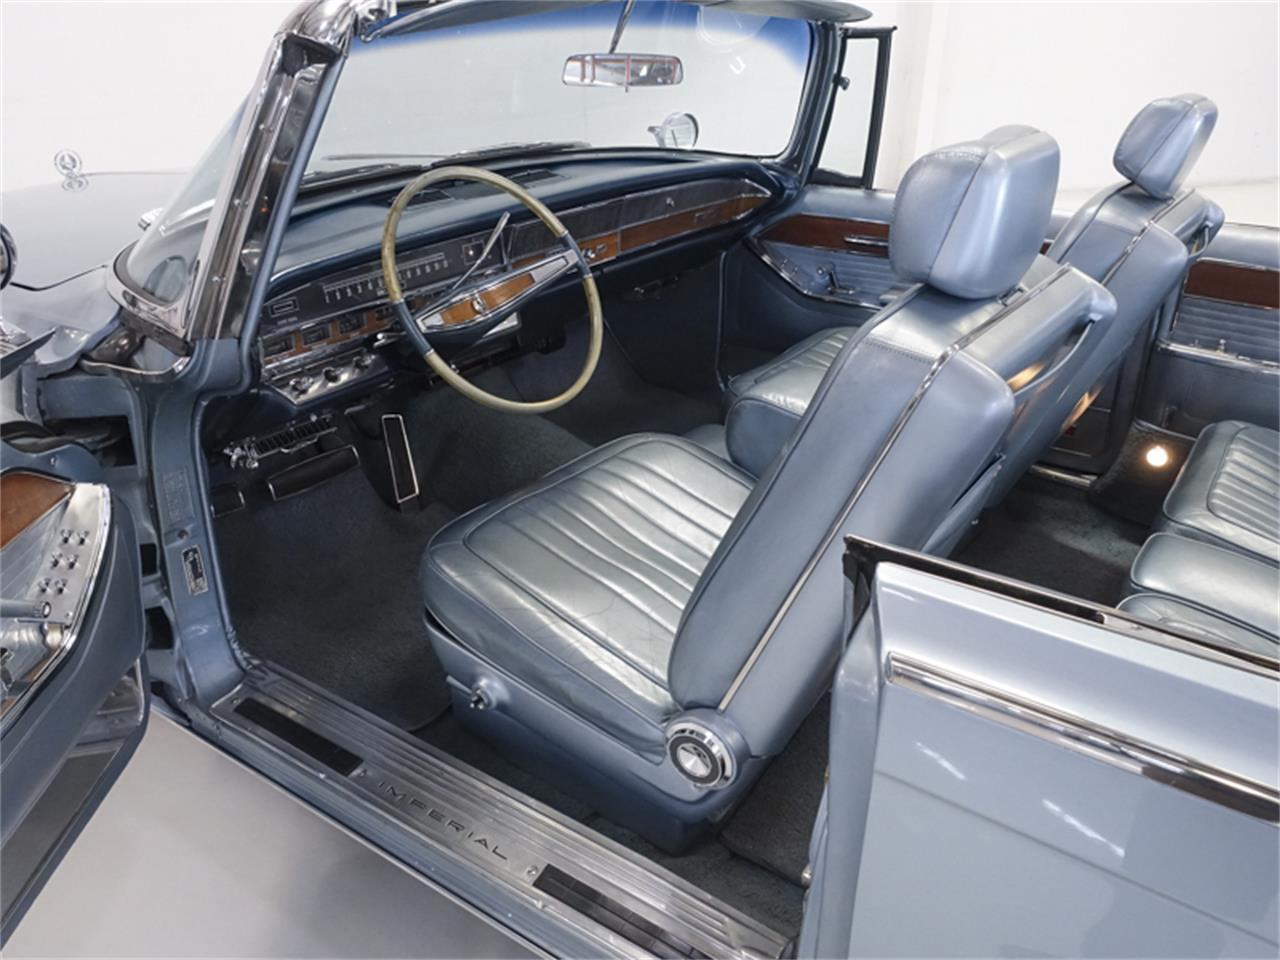 1965 Chrysler Imperial Crown (CC-1214860) for sale in Saint Louis, Missouri